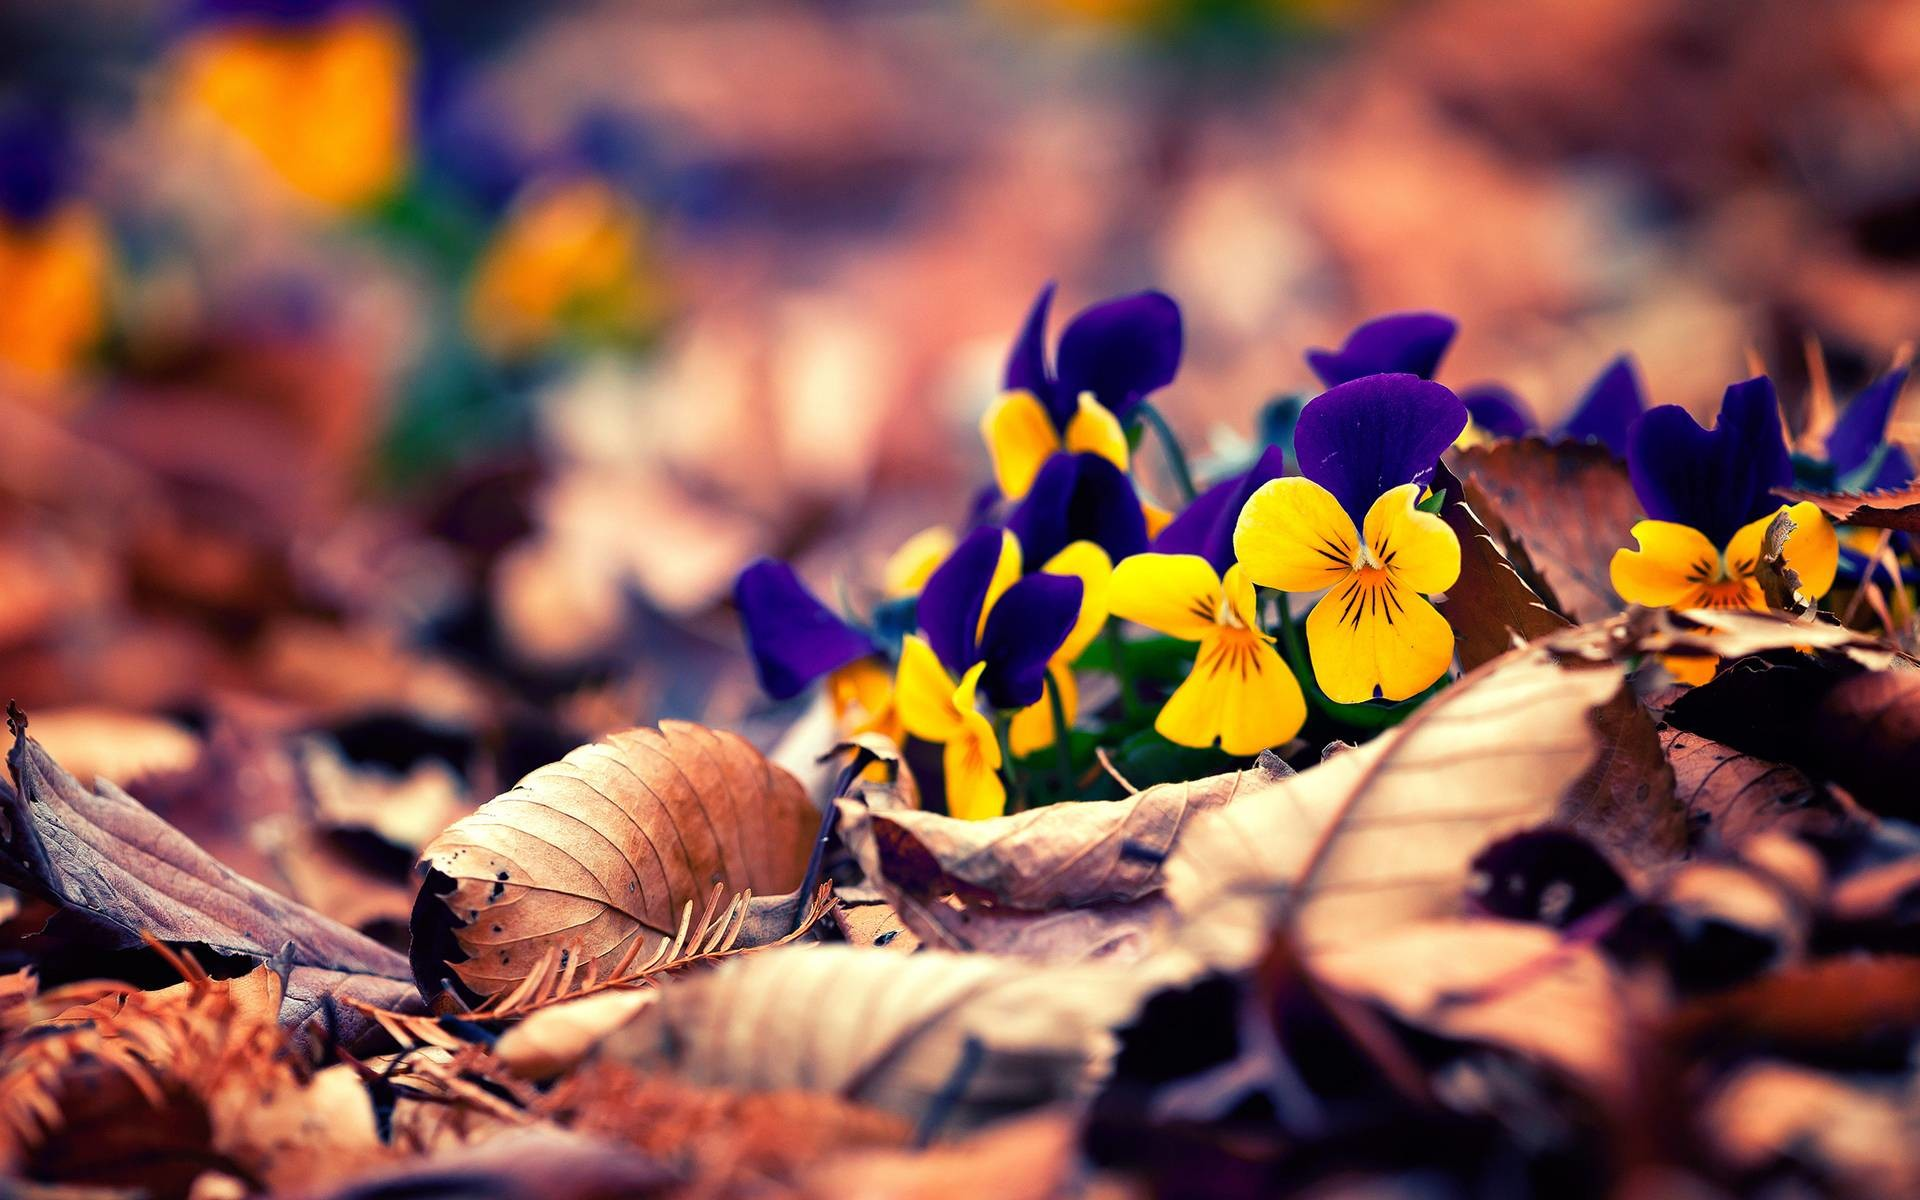 fall flowers background images | walljpeg.